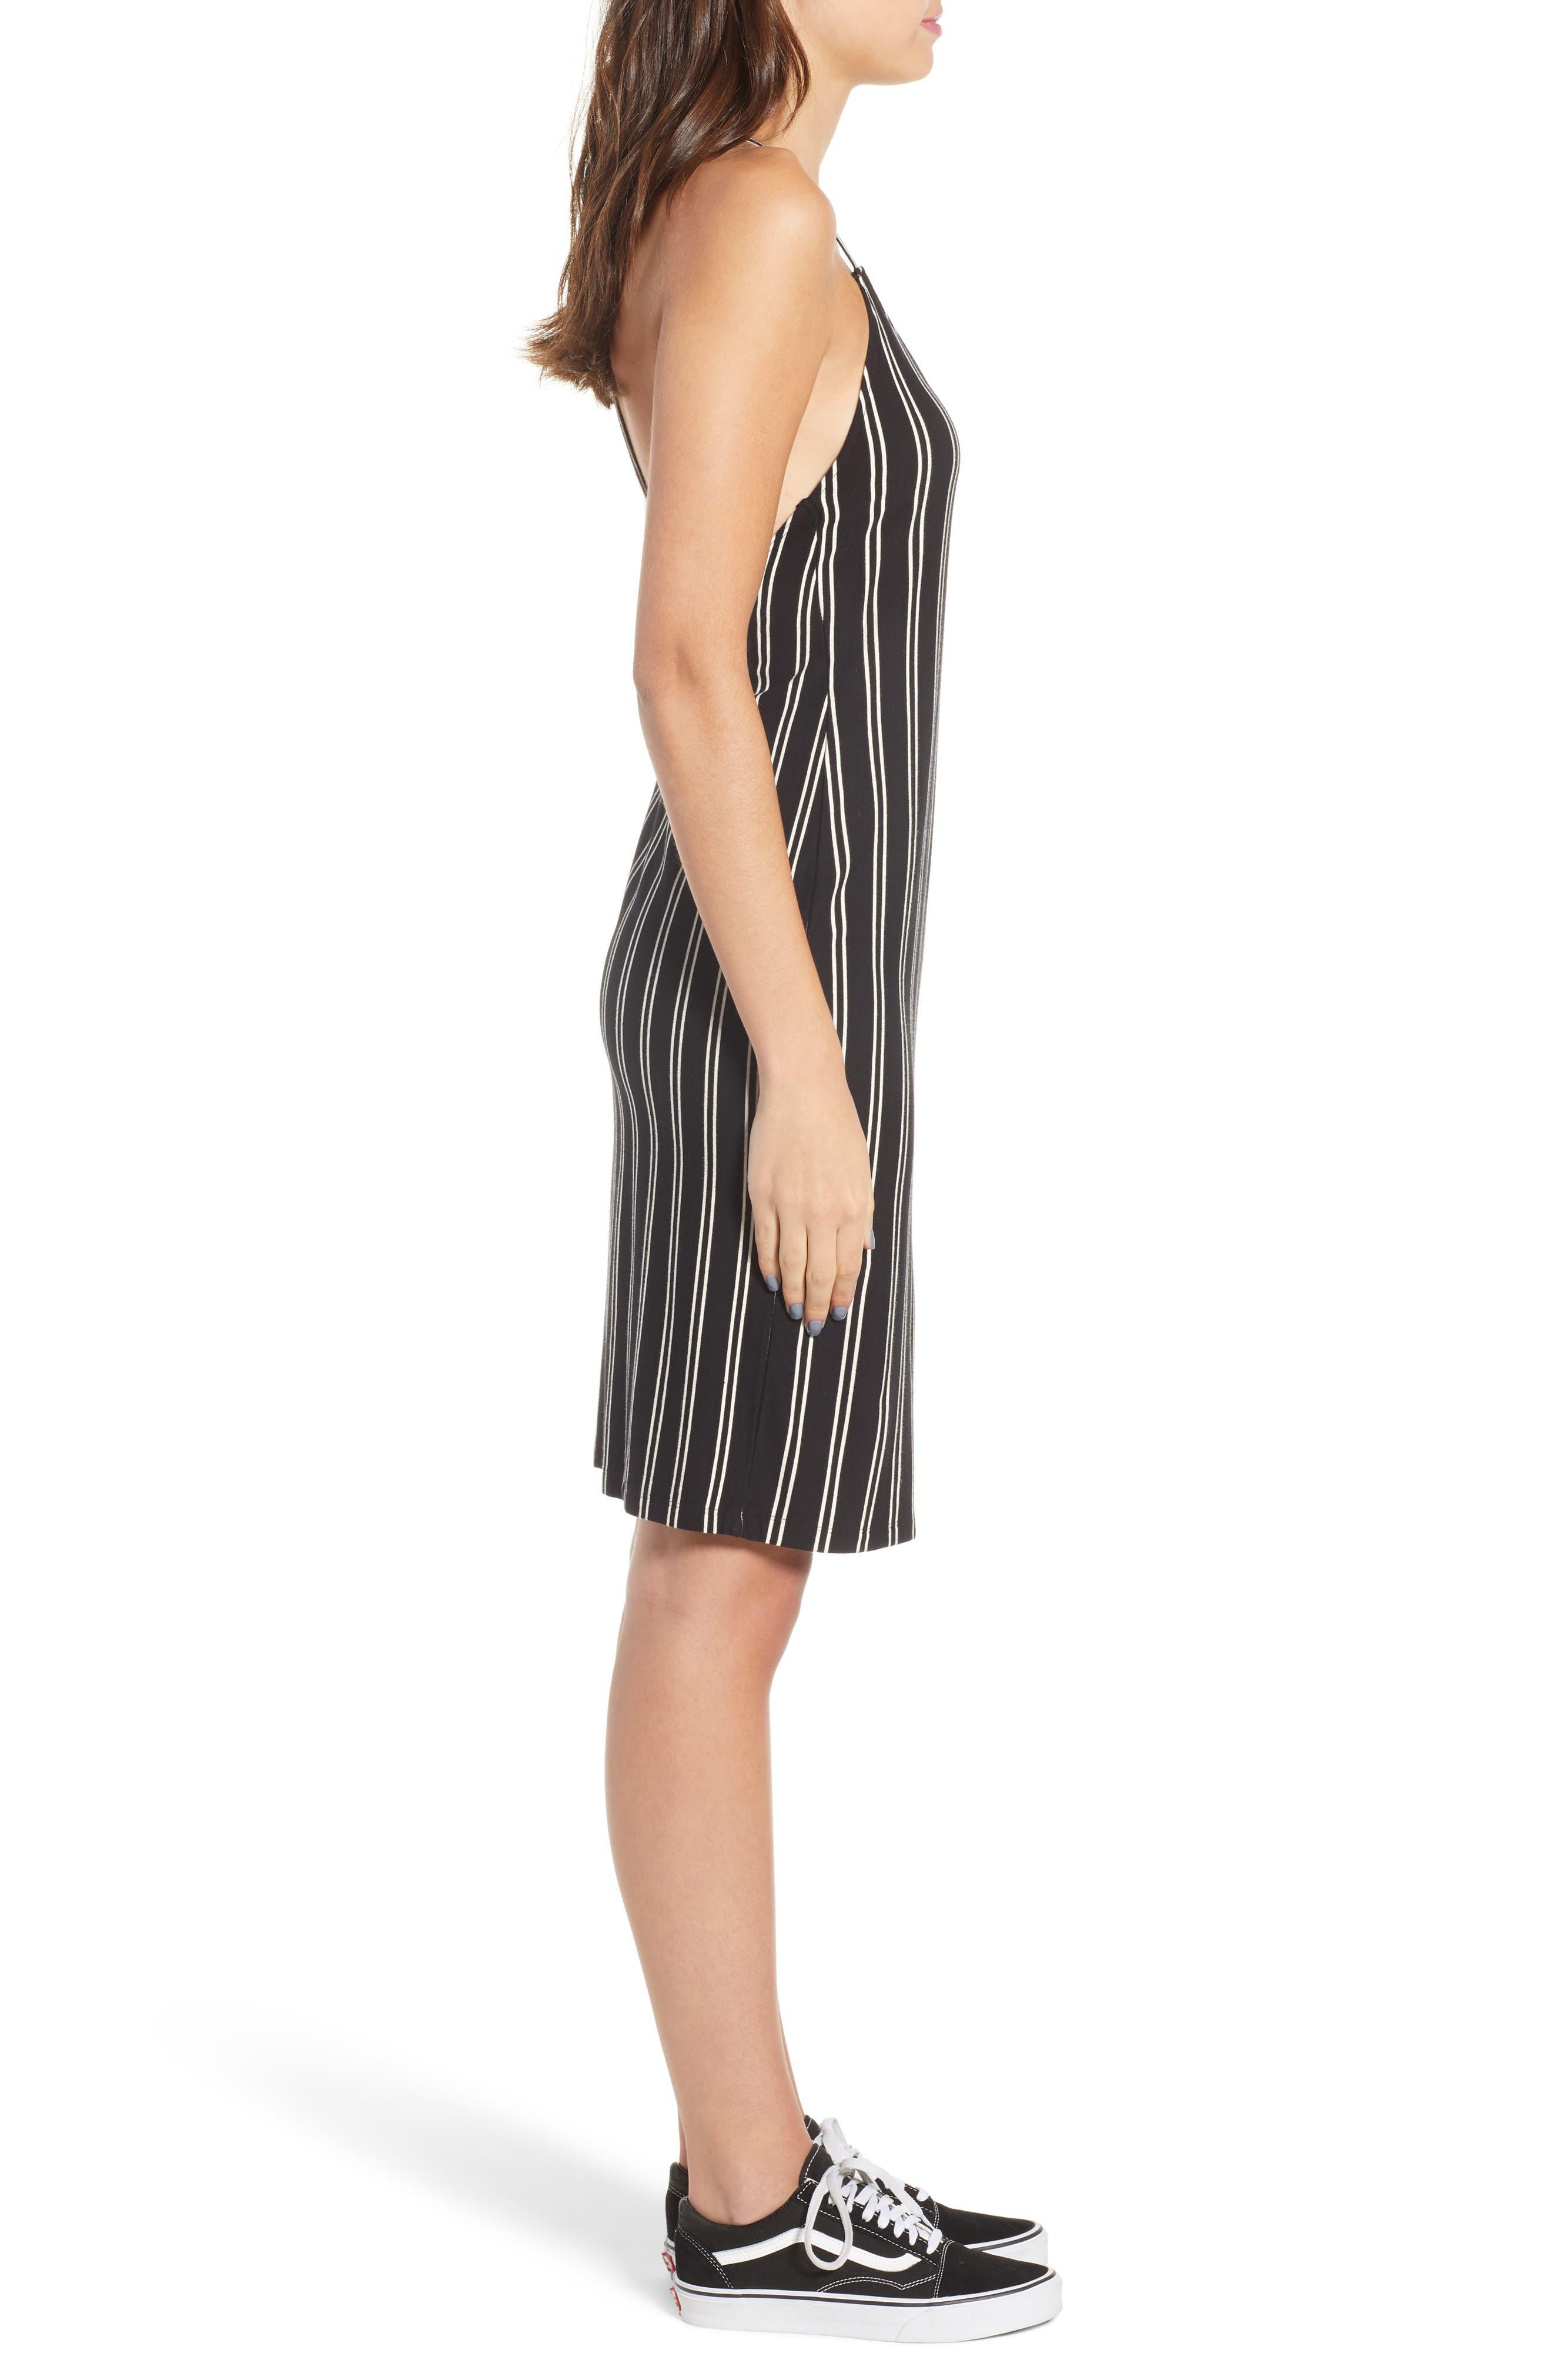 Lockette Strappy Striped Dress,                             Alternate thumbnail 3, color,